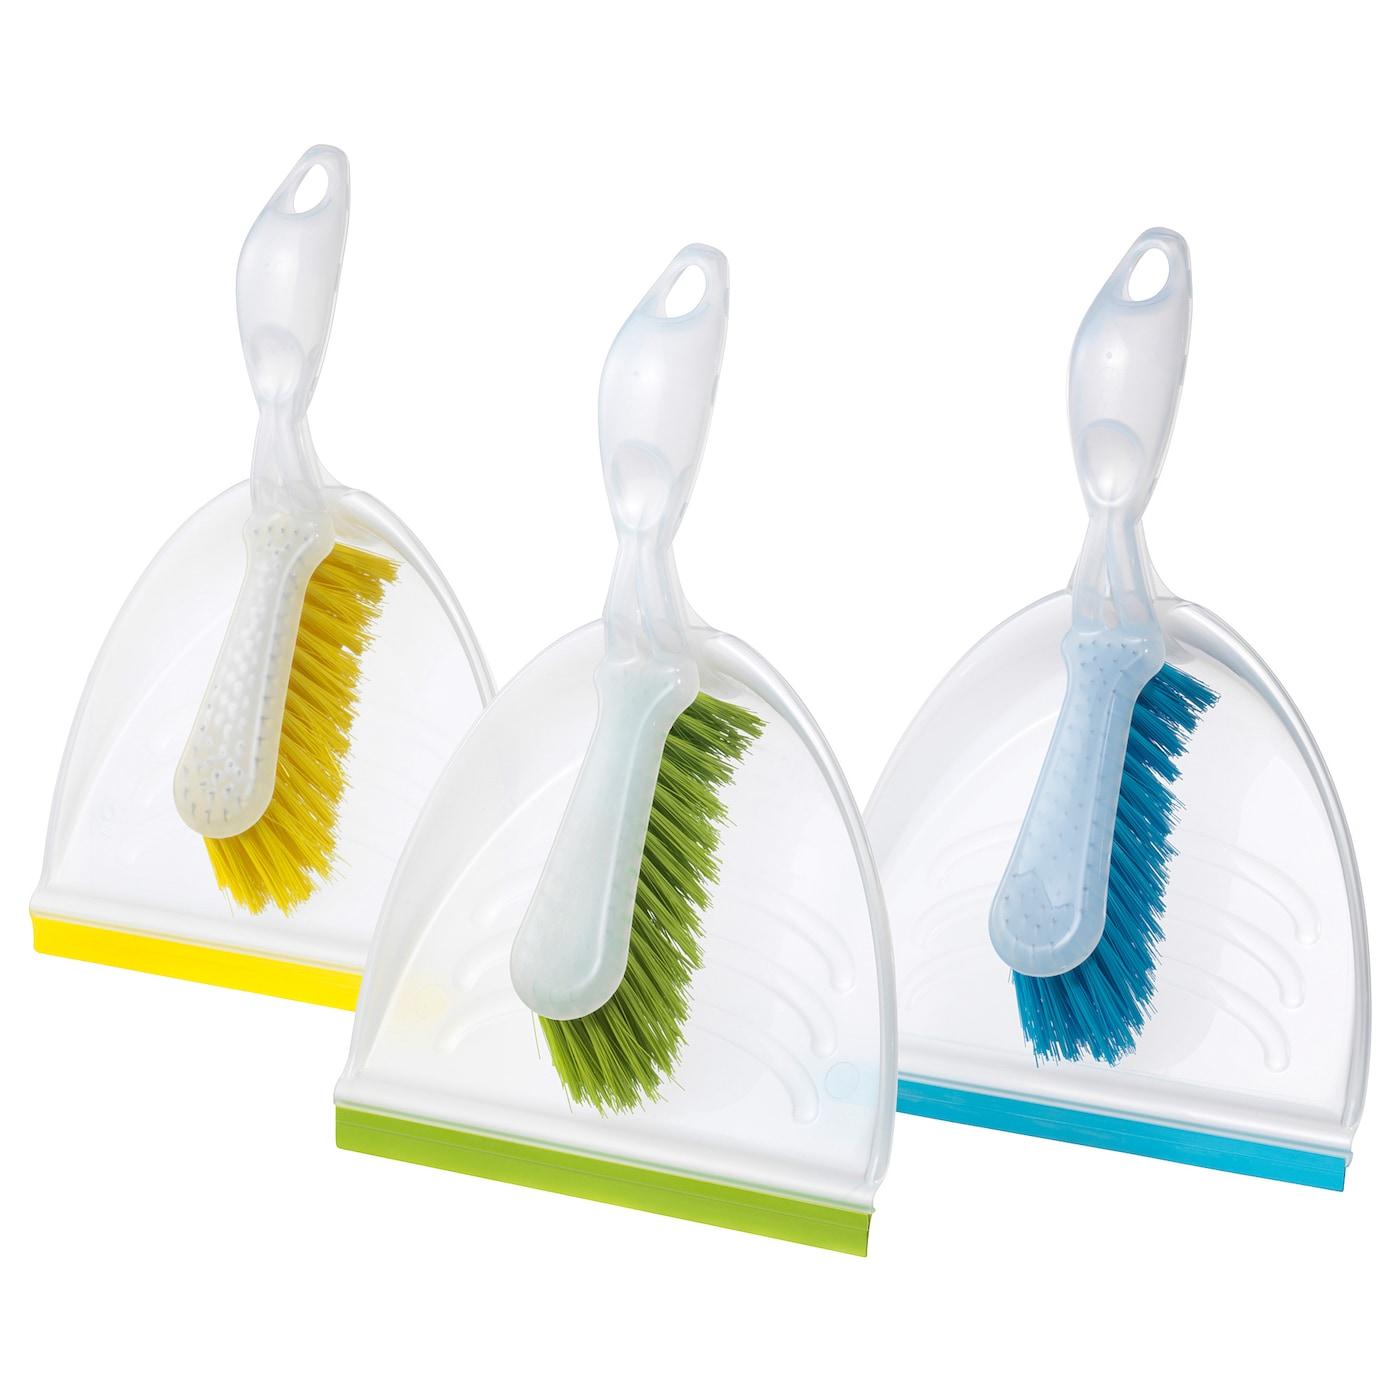 Dust Pan And Brush Blaska Assorted Colours